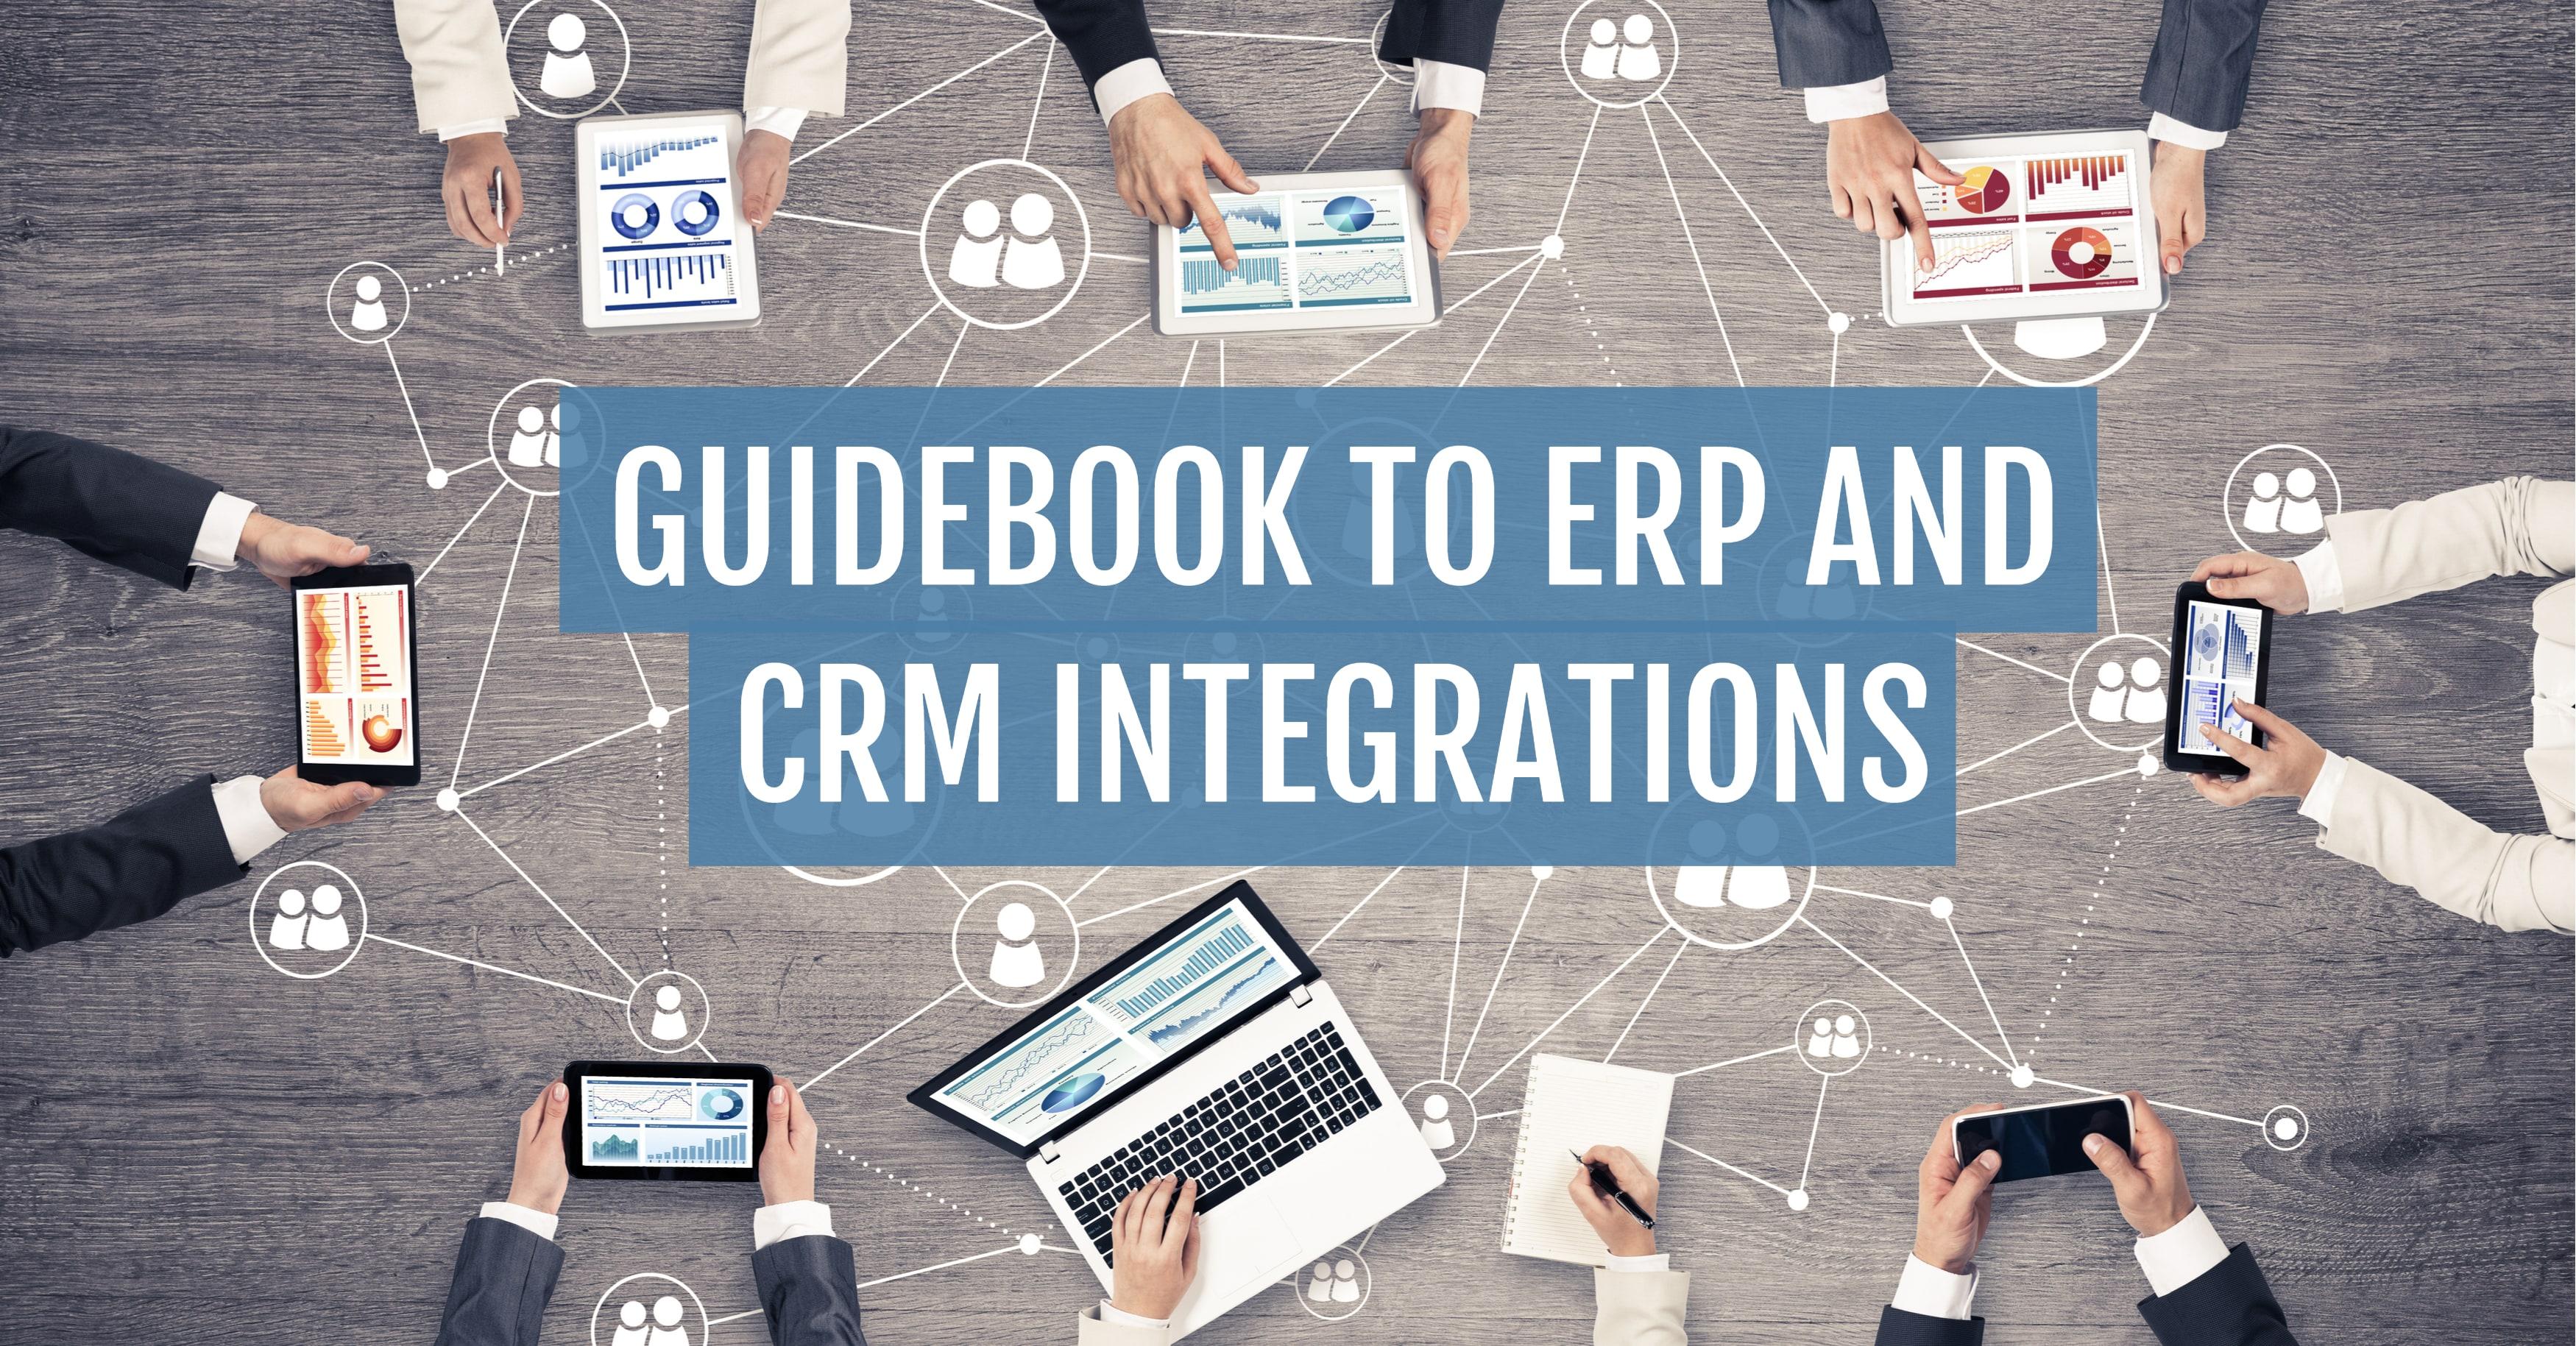 ERP CRM Integration Guide